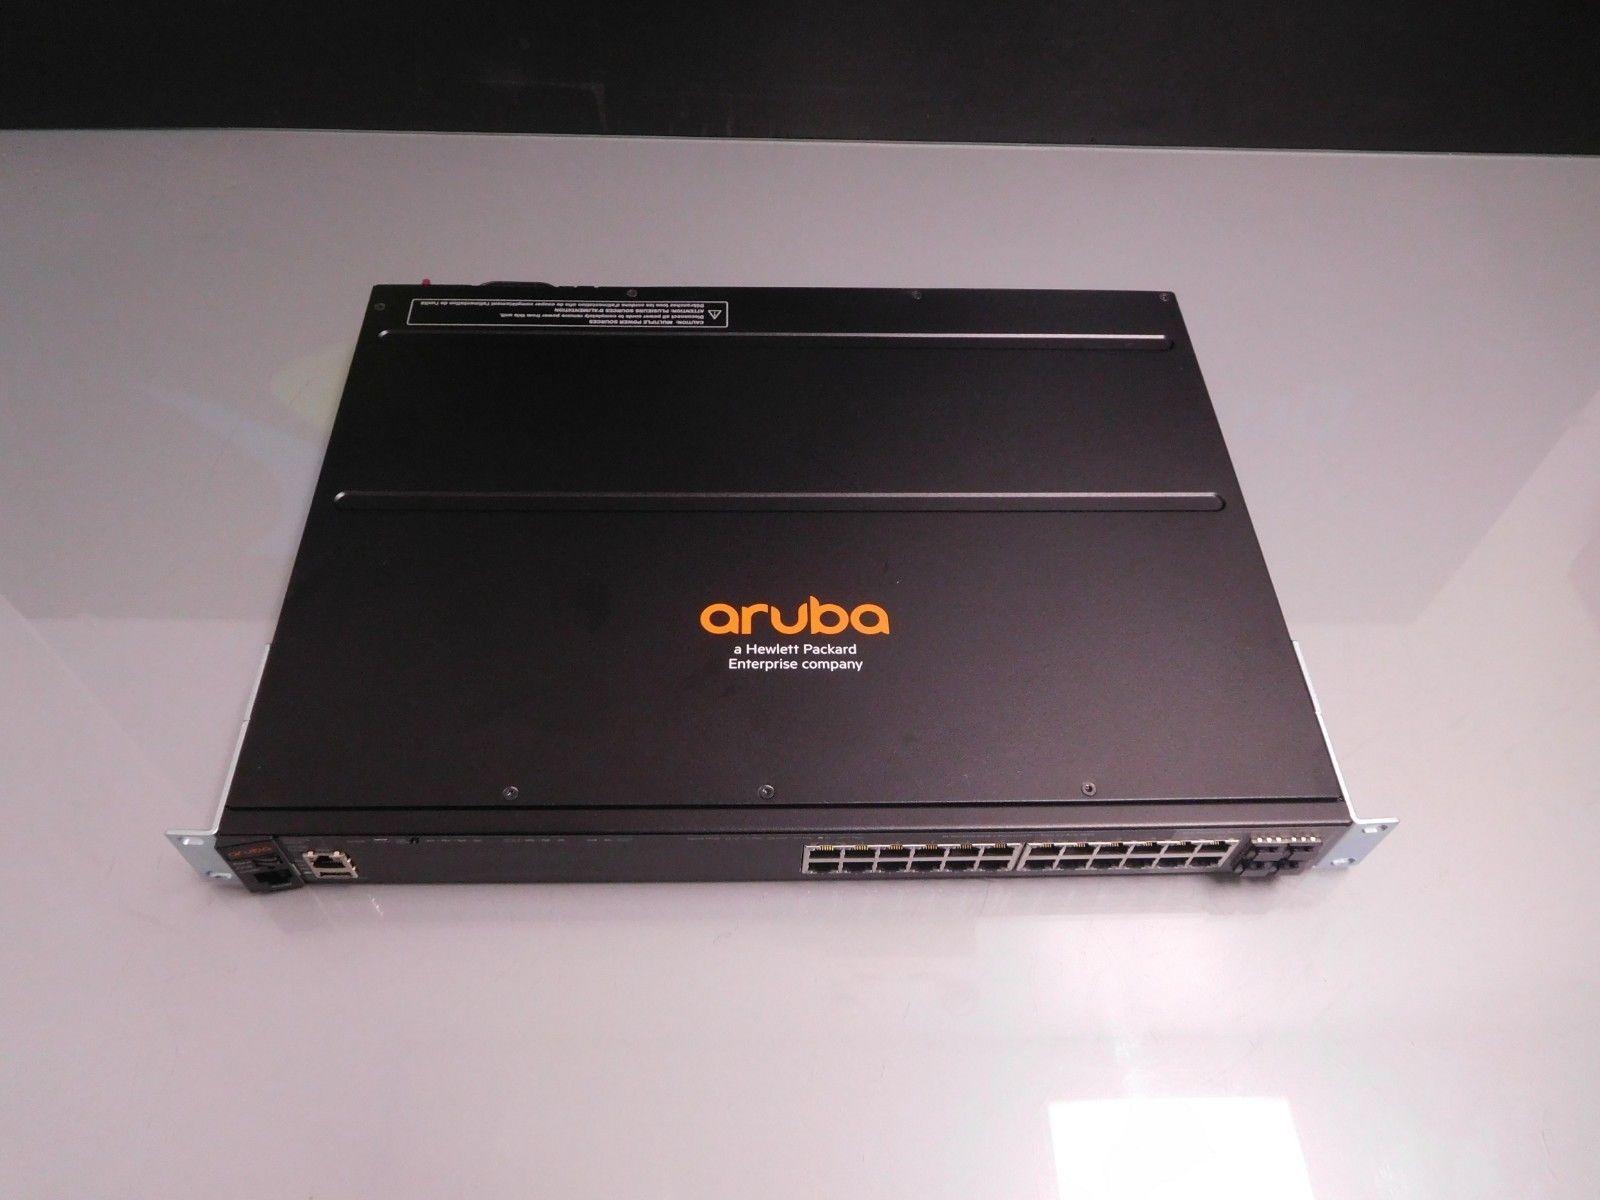 HP J9726A Aruba 2920-24G 24-Port Managed and 50 similar items